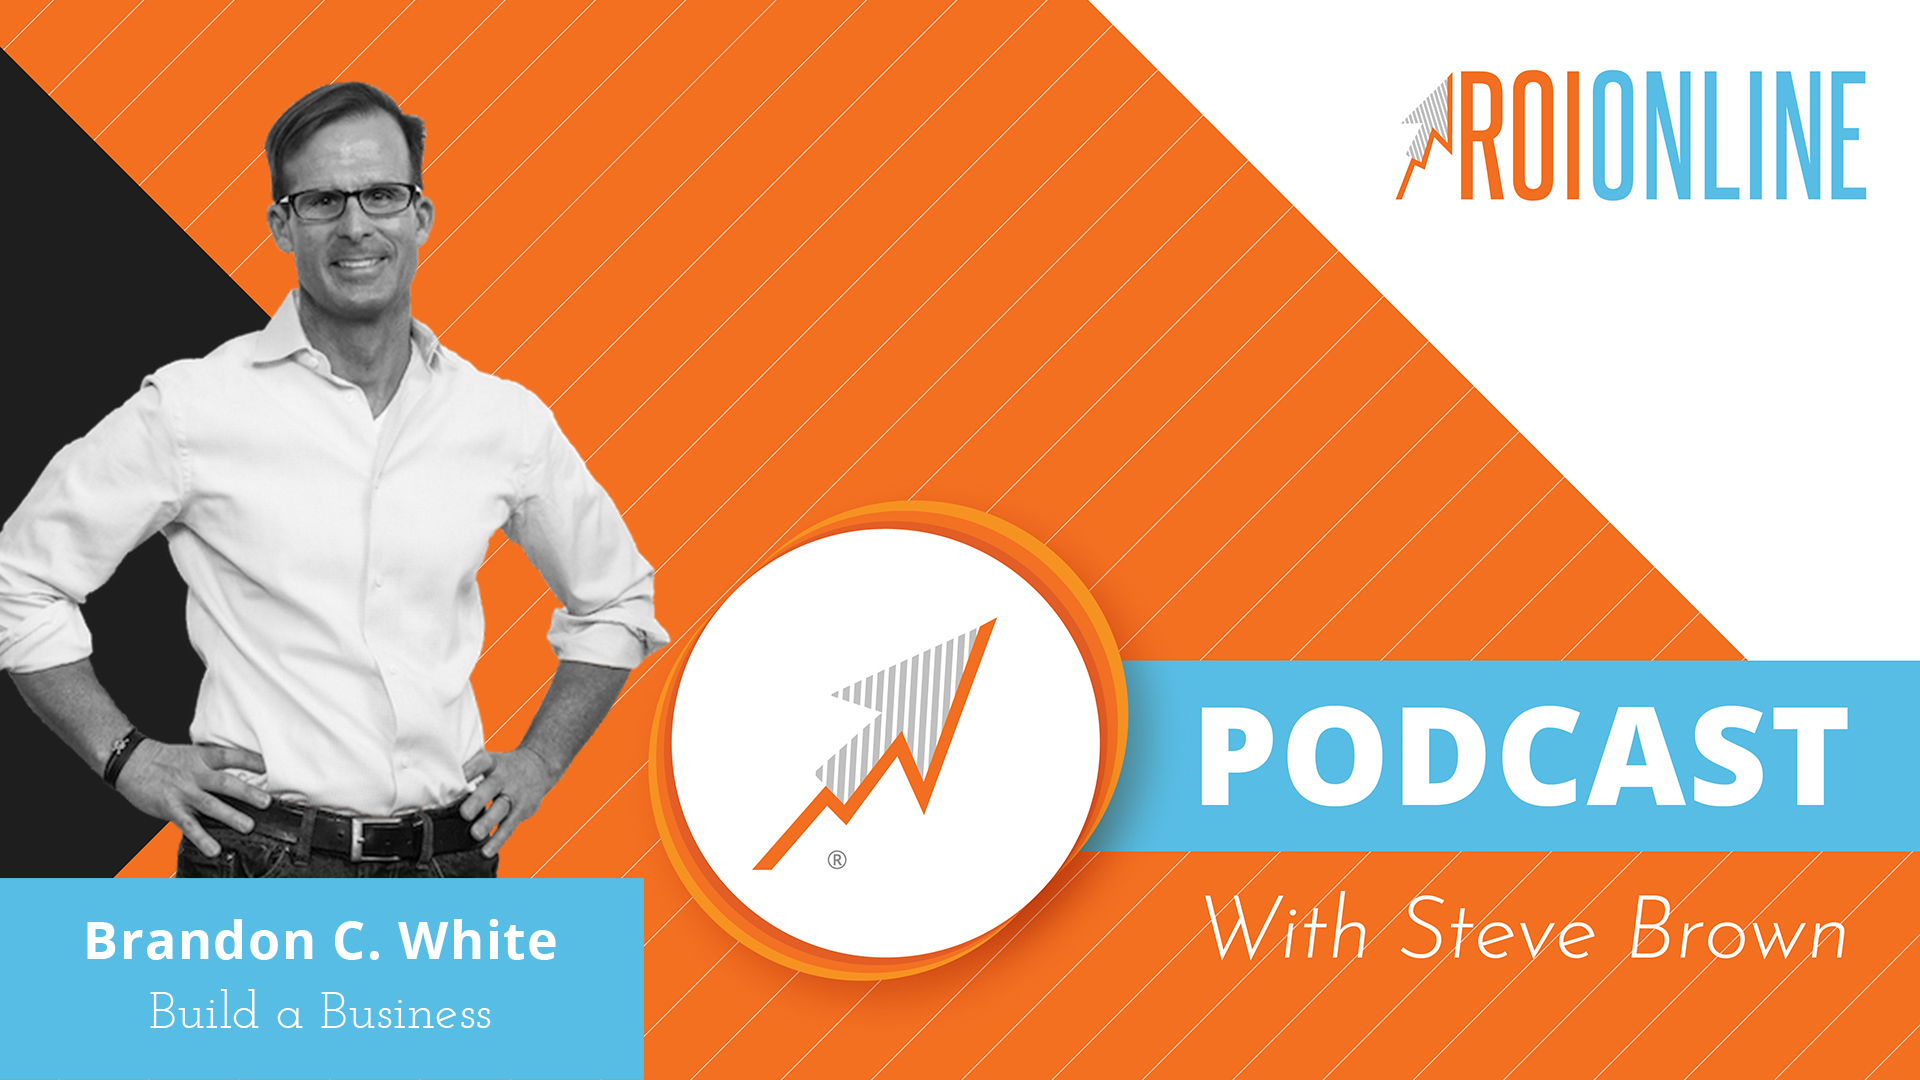 ROI Online Podcast thumbnail graphic of Brandon C White